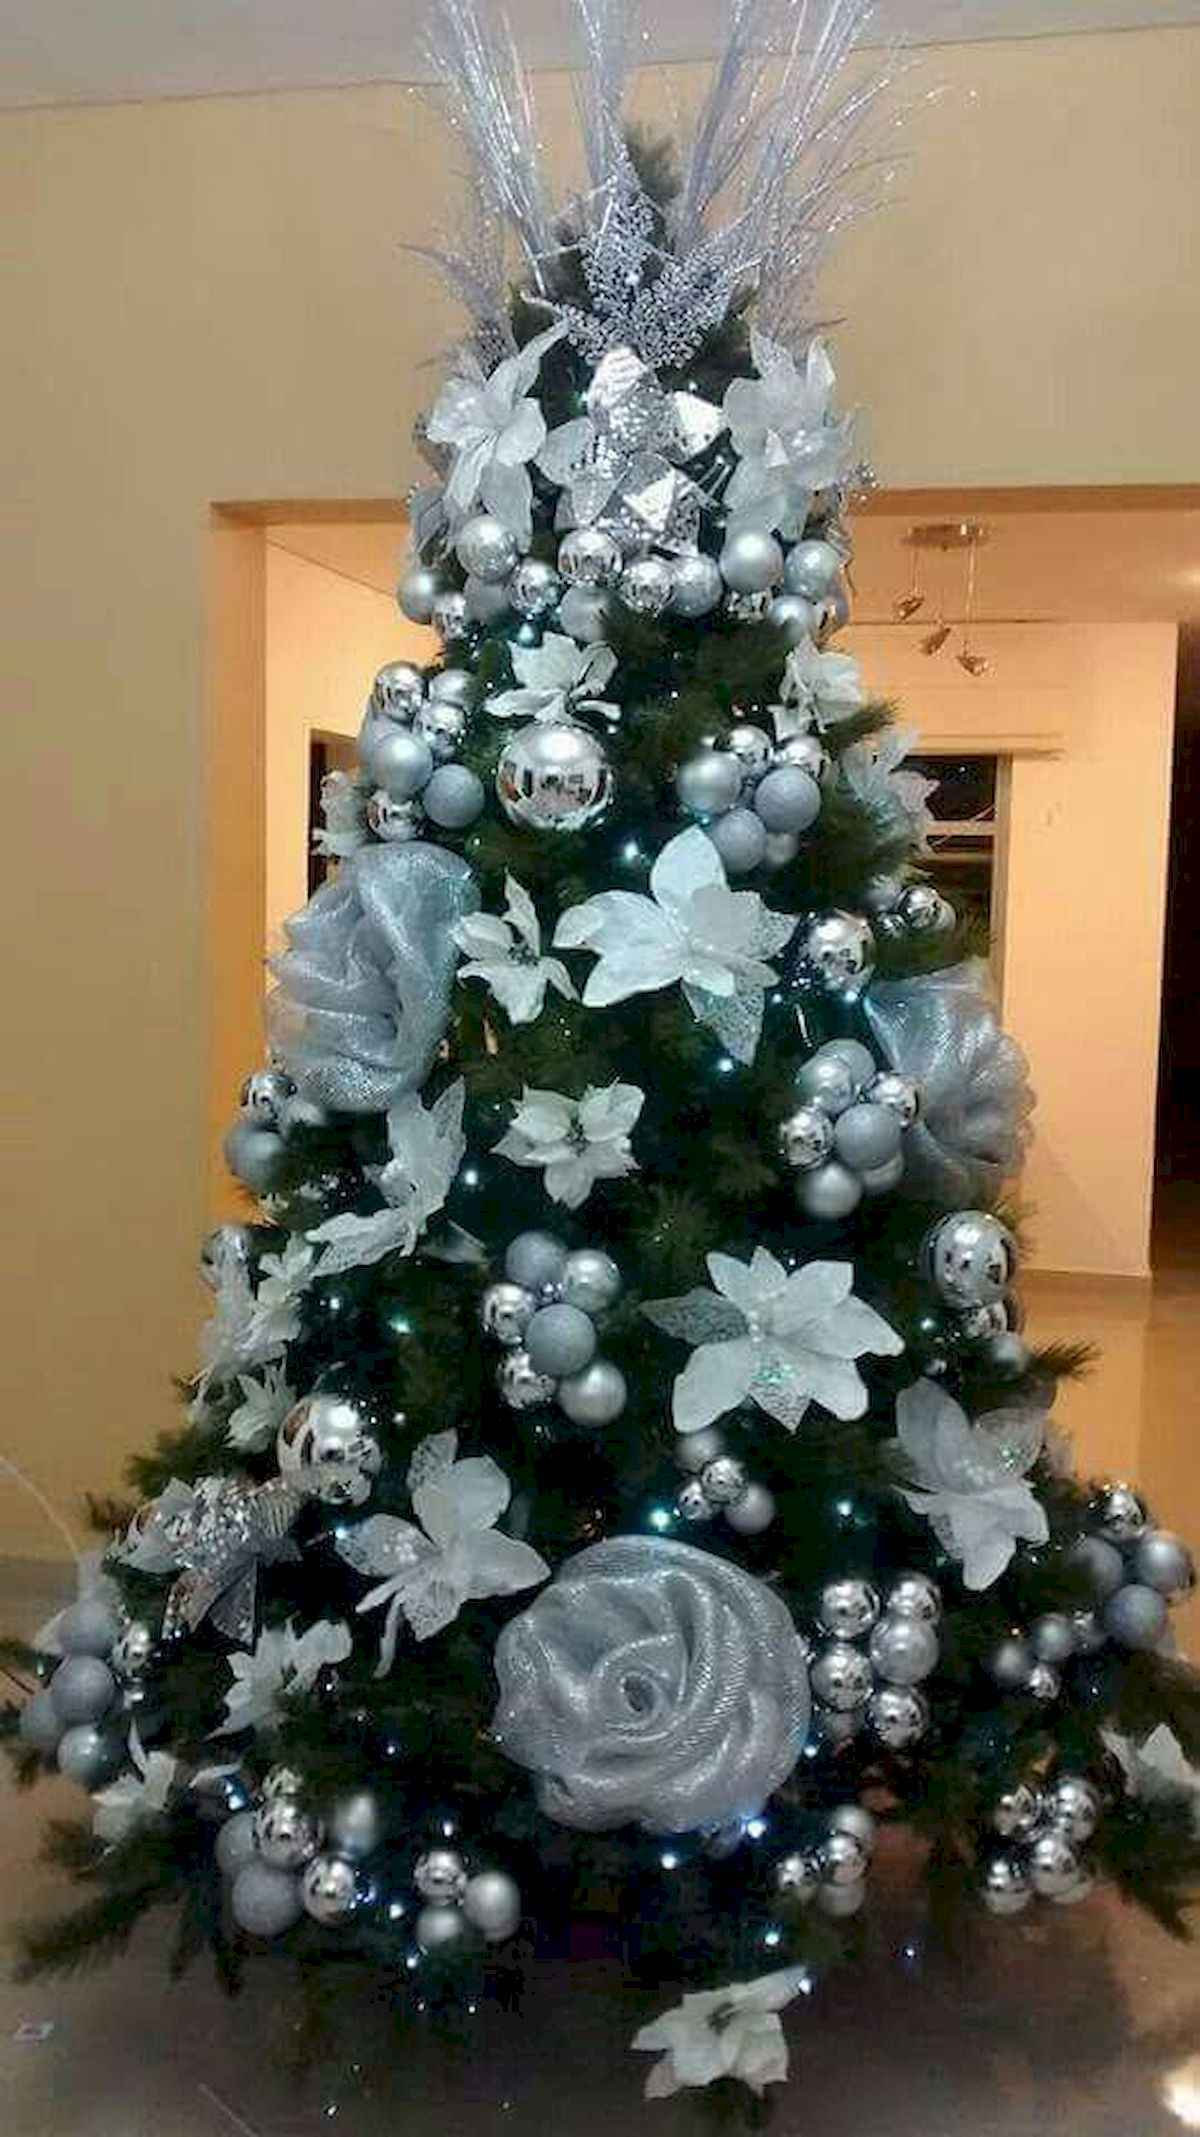 40 unique christmas tree ideas decorations (3)